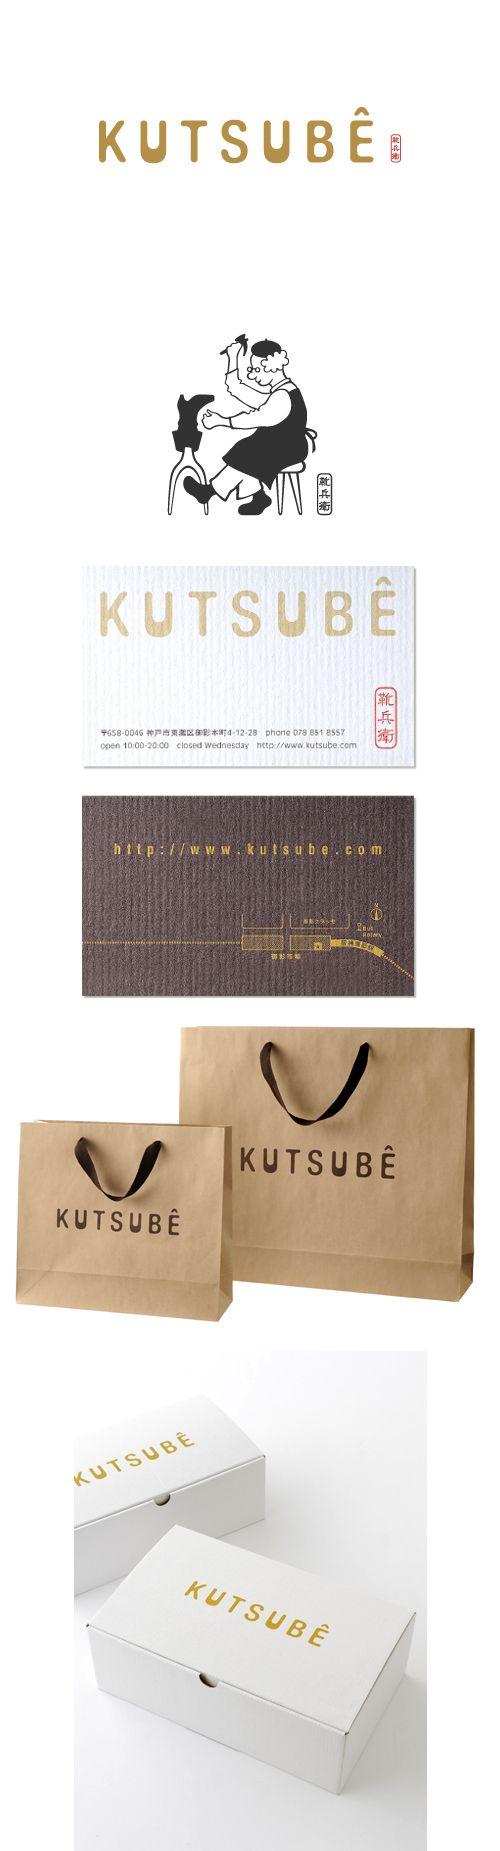 KUTSUBÊ / shoes shop / naming / logo / shop card / paper bag / shoes box / FROM GRAPHIC